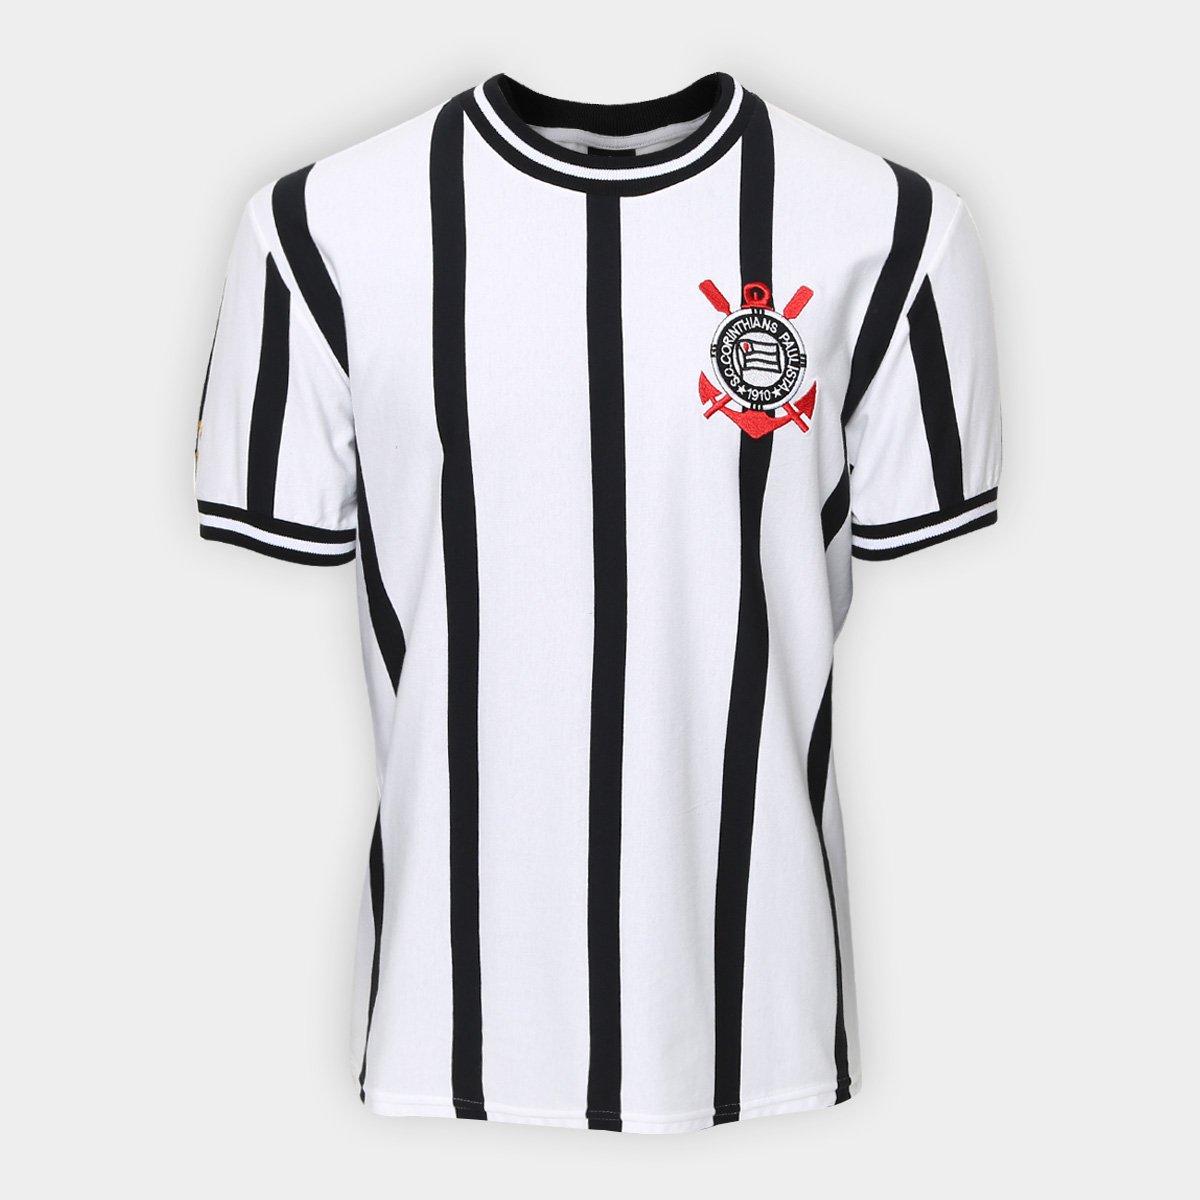 Camiseta Corinthians Réplica 1971 Masculina - Branco e Preto ... 6512f5e1e5557